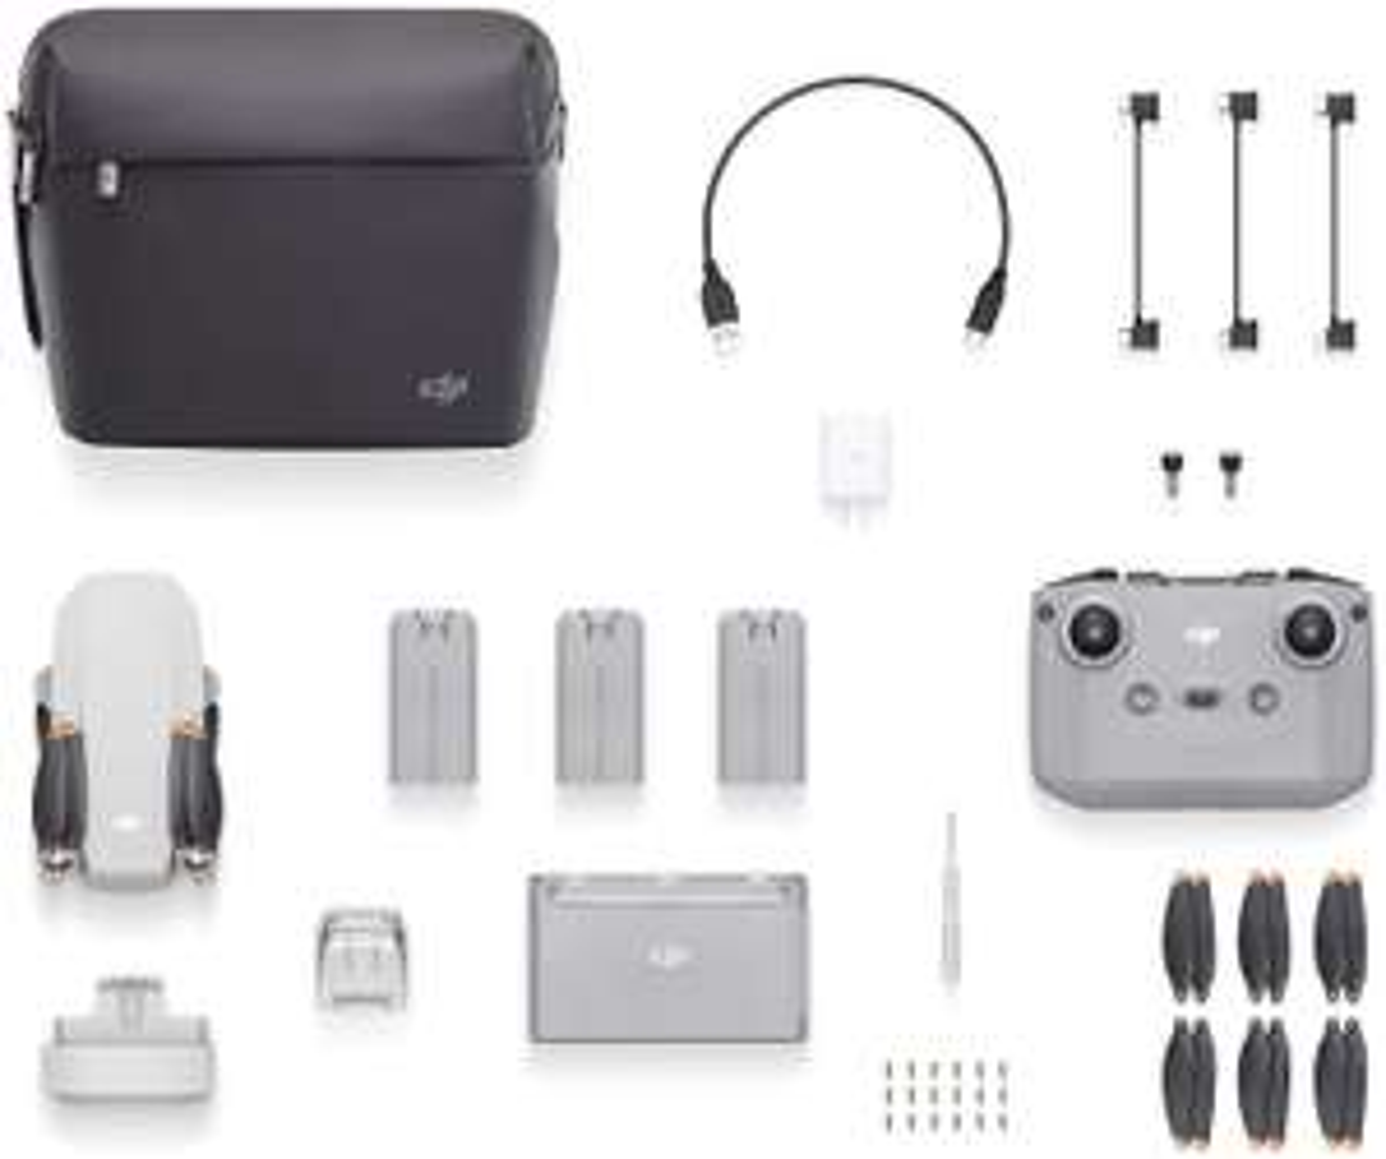 Amazon - DJI Mini 2 Fly More Combo + Care Refresh